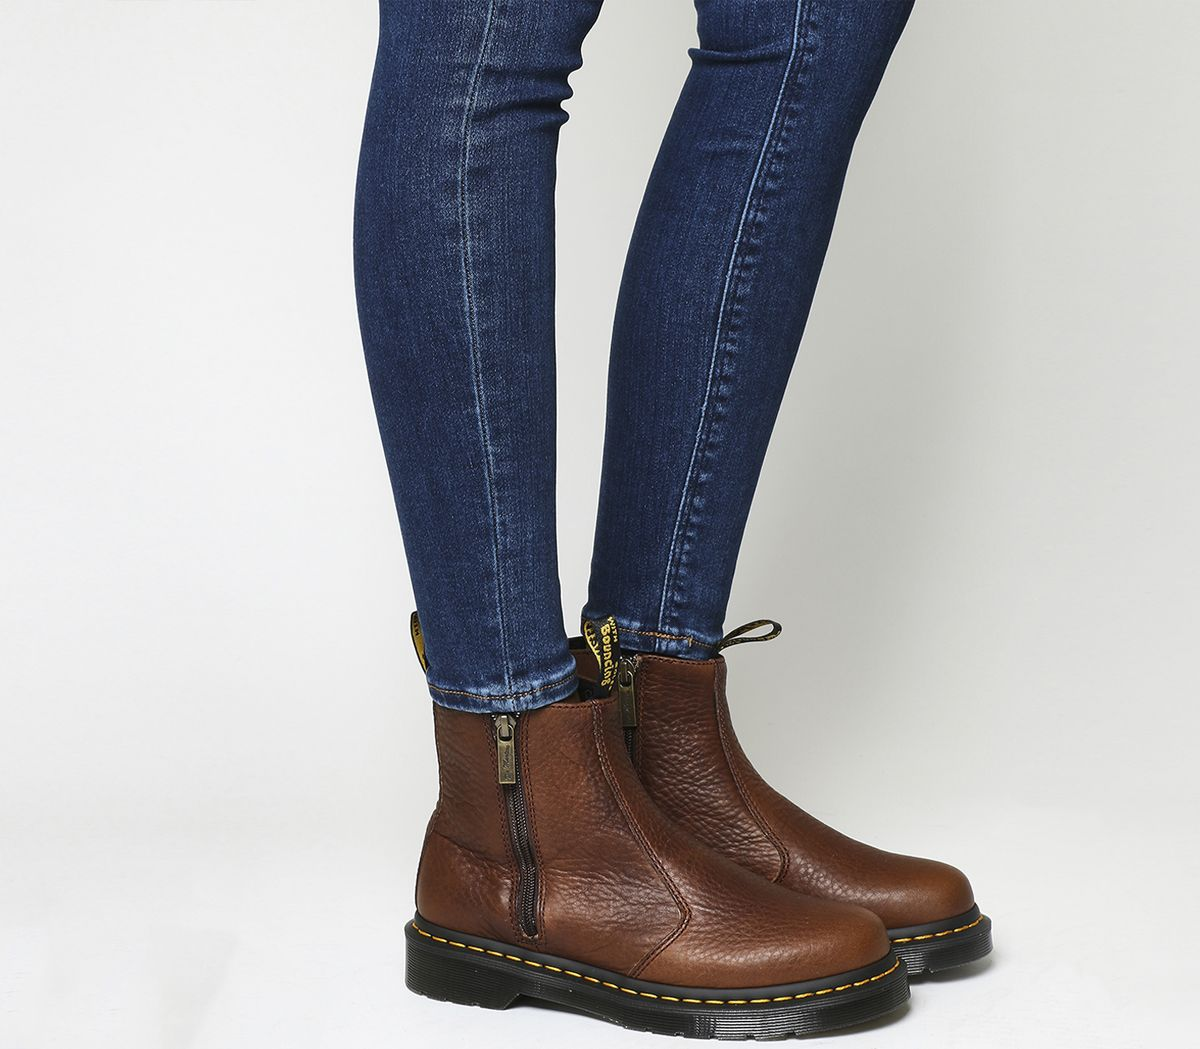 b2cf5b78e 2976 Zip Chelsea Boots   fashion sense   Brown leather ankle boots ...